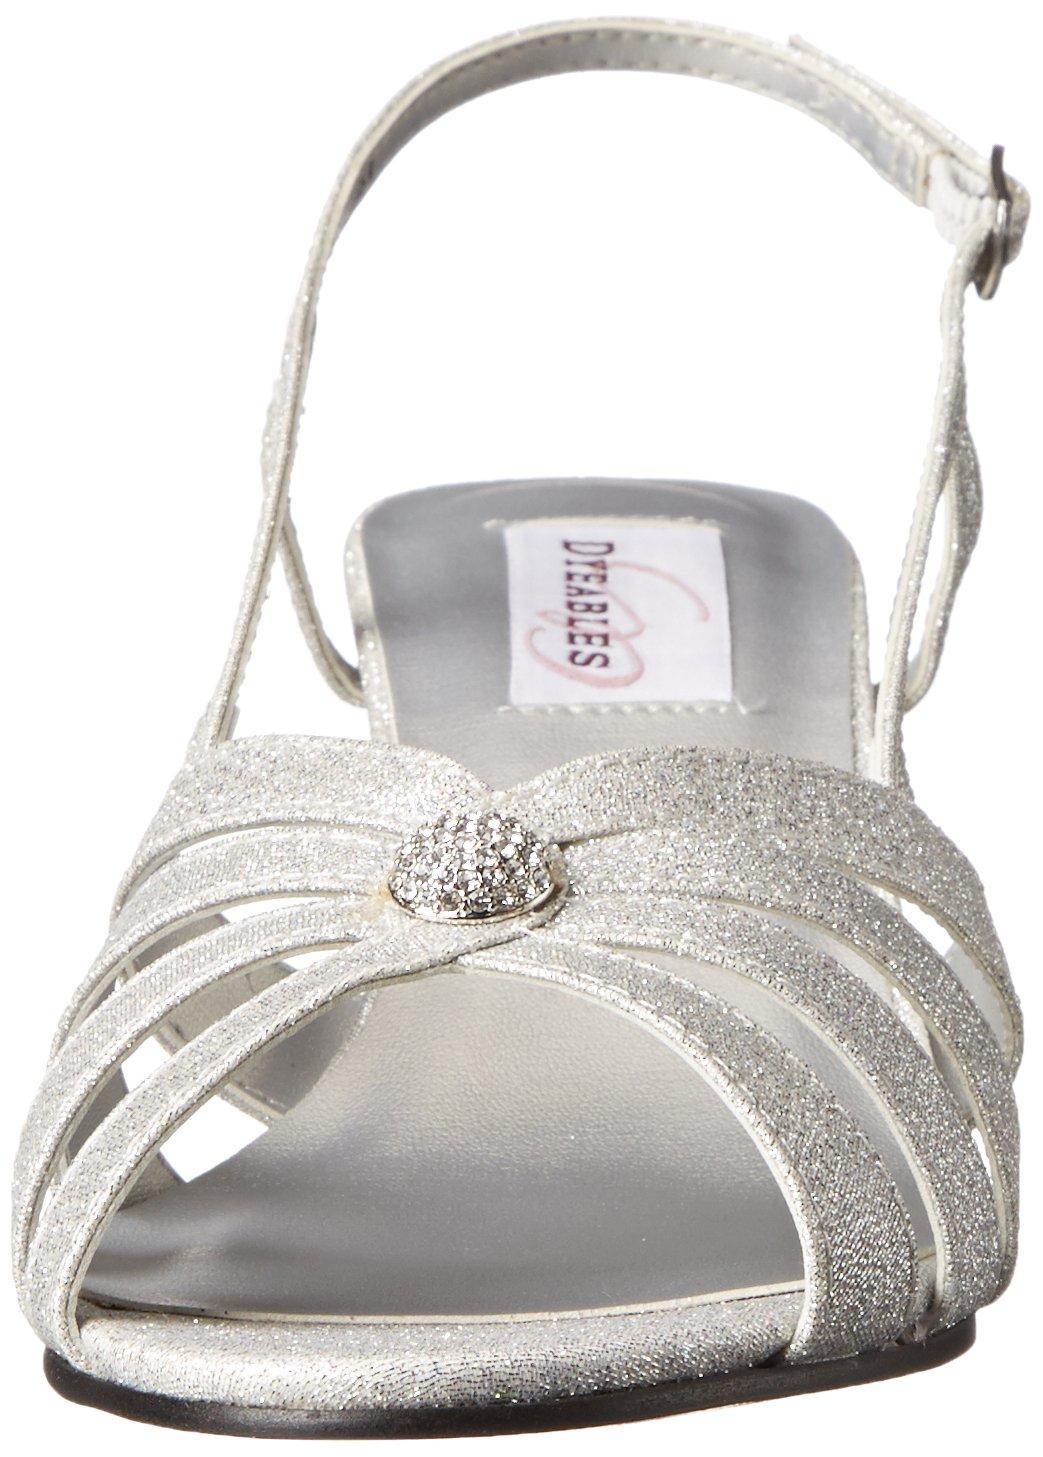 Dyeables, Inc Womens Fiona Dress Sandal B00ZWNB3CO 10 B(M) US|Silver Sparkle